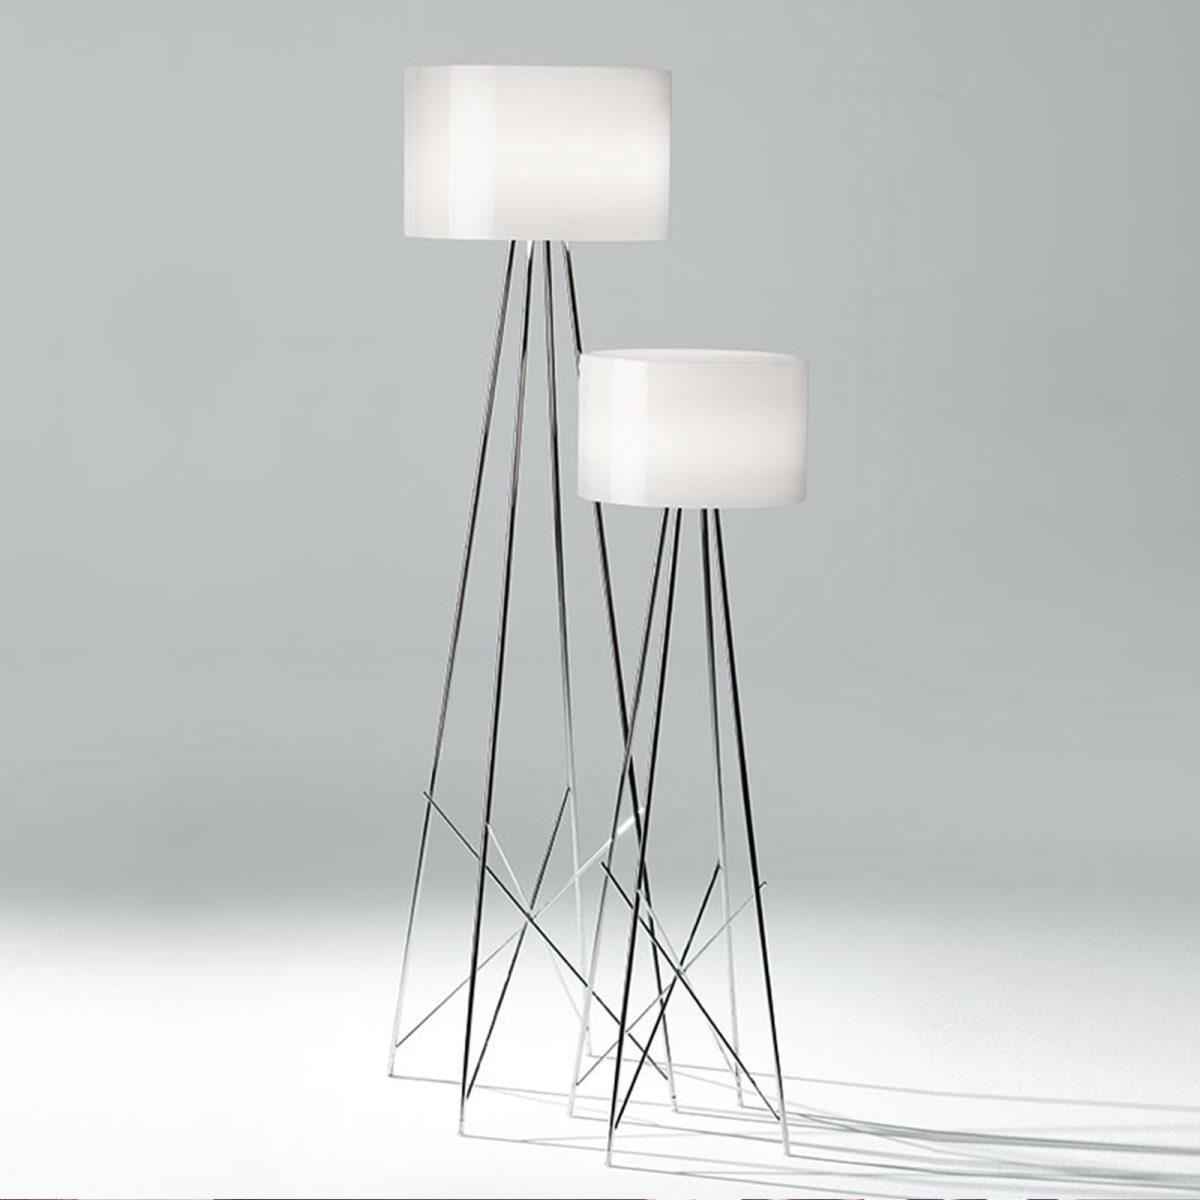 ray-f1-f2-floor-lamp-flosxy